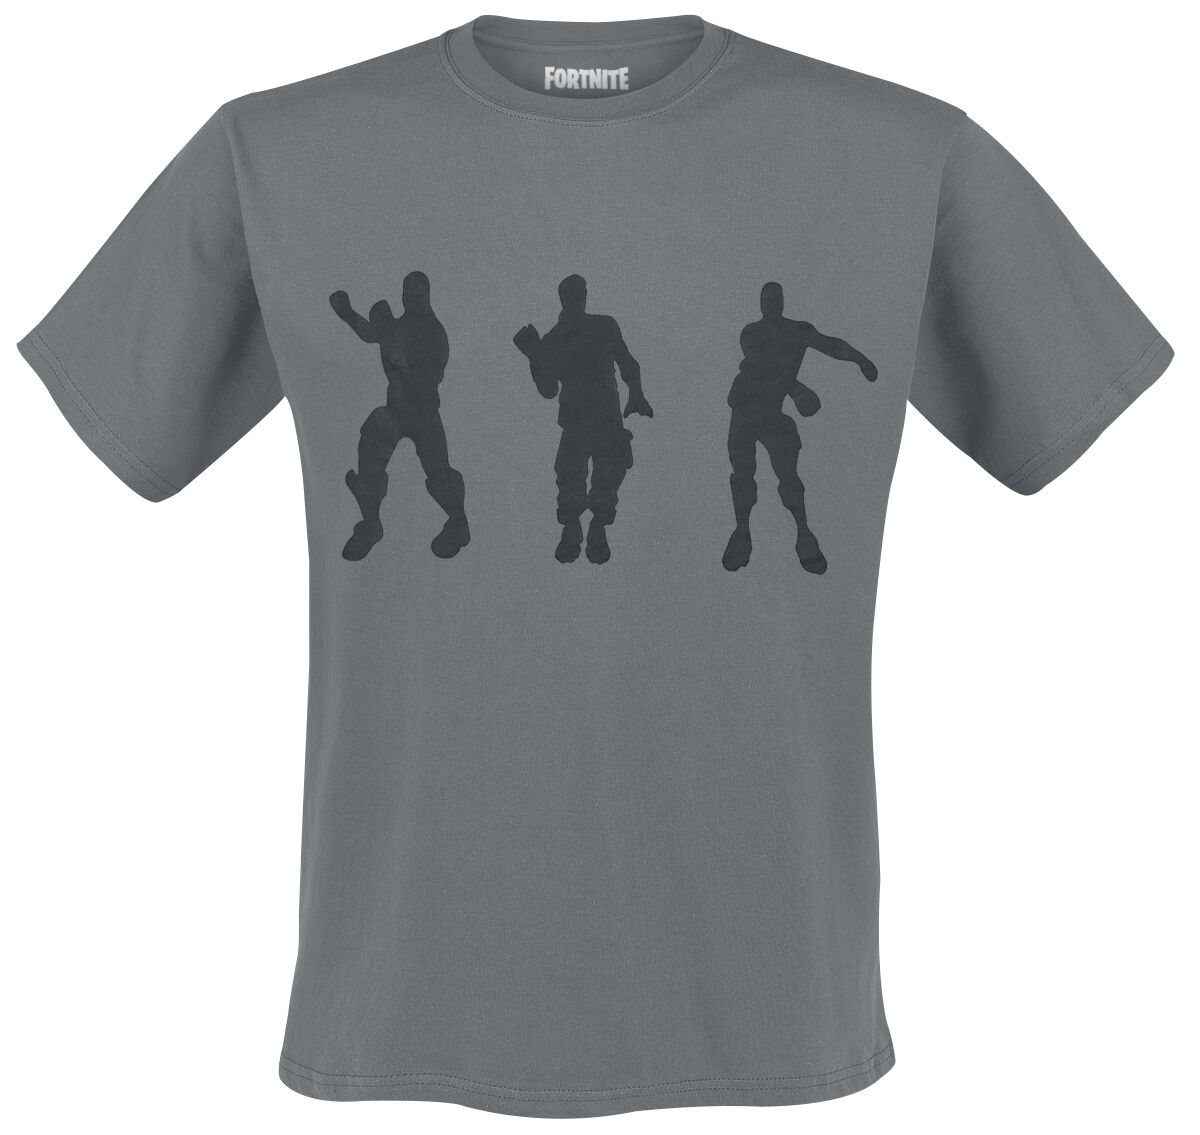 Floss Dance Fortnite T Shirt Emp